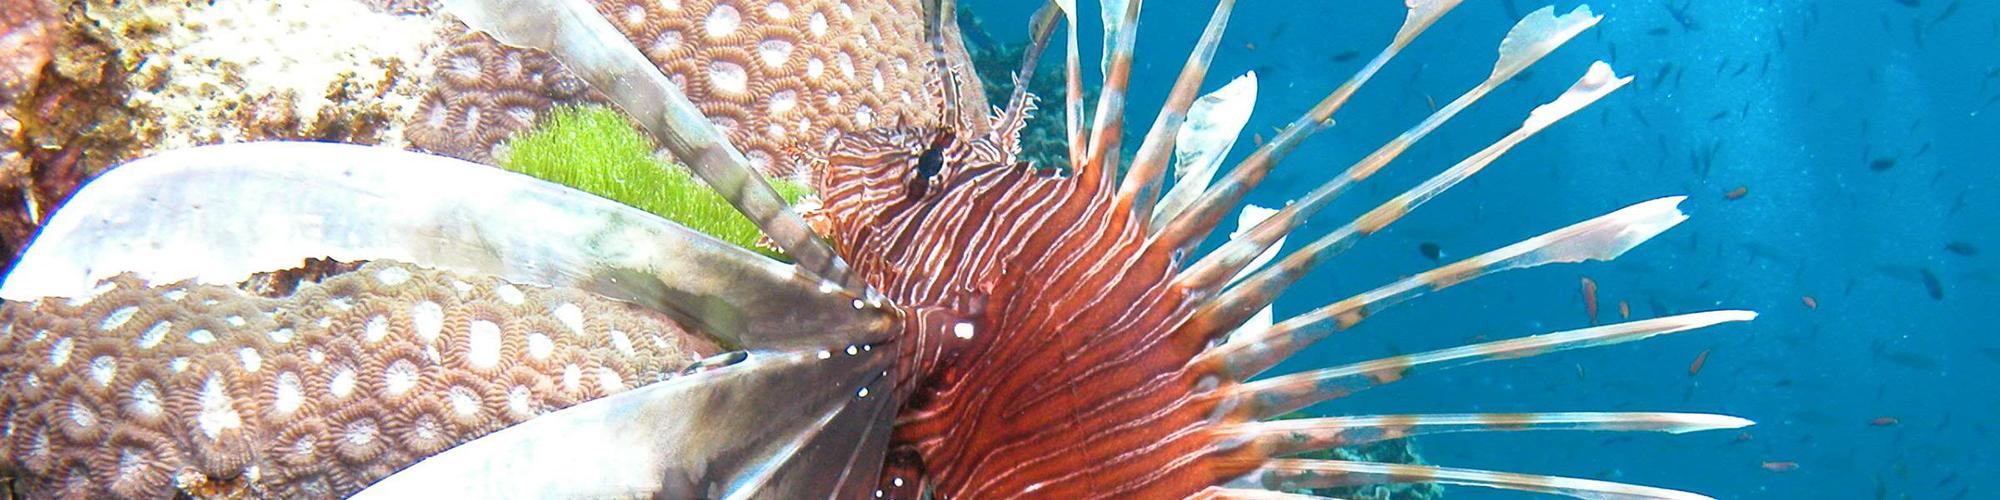 WS Australia slice lion fish.jpg